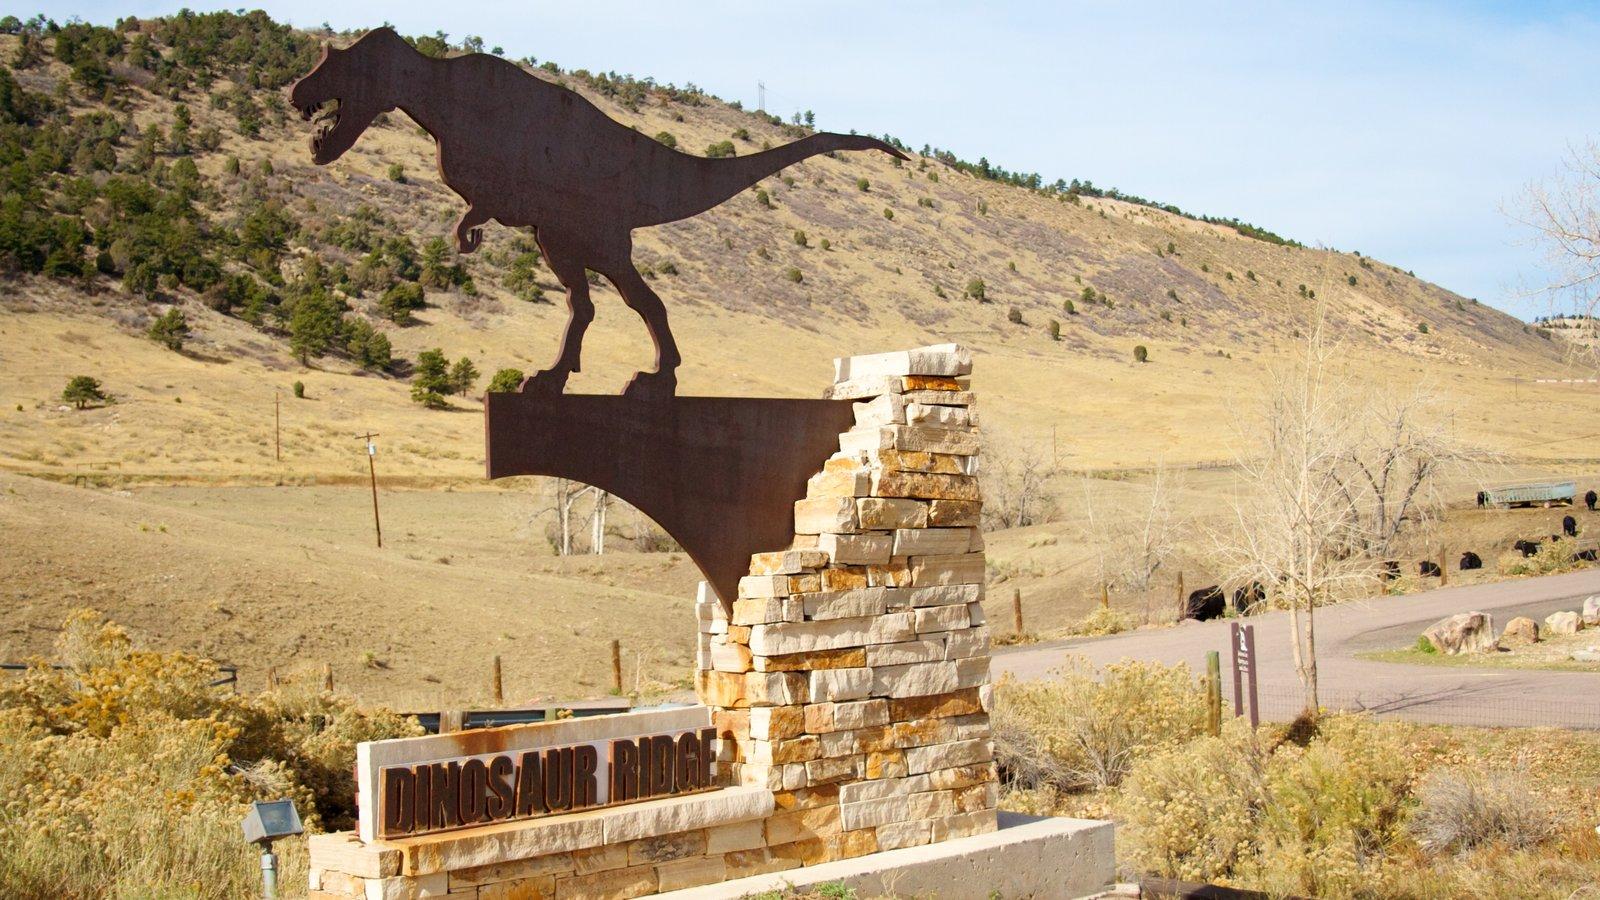 Dinosaur Ridge caracterizando sinalização, paisagem e passeios